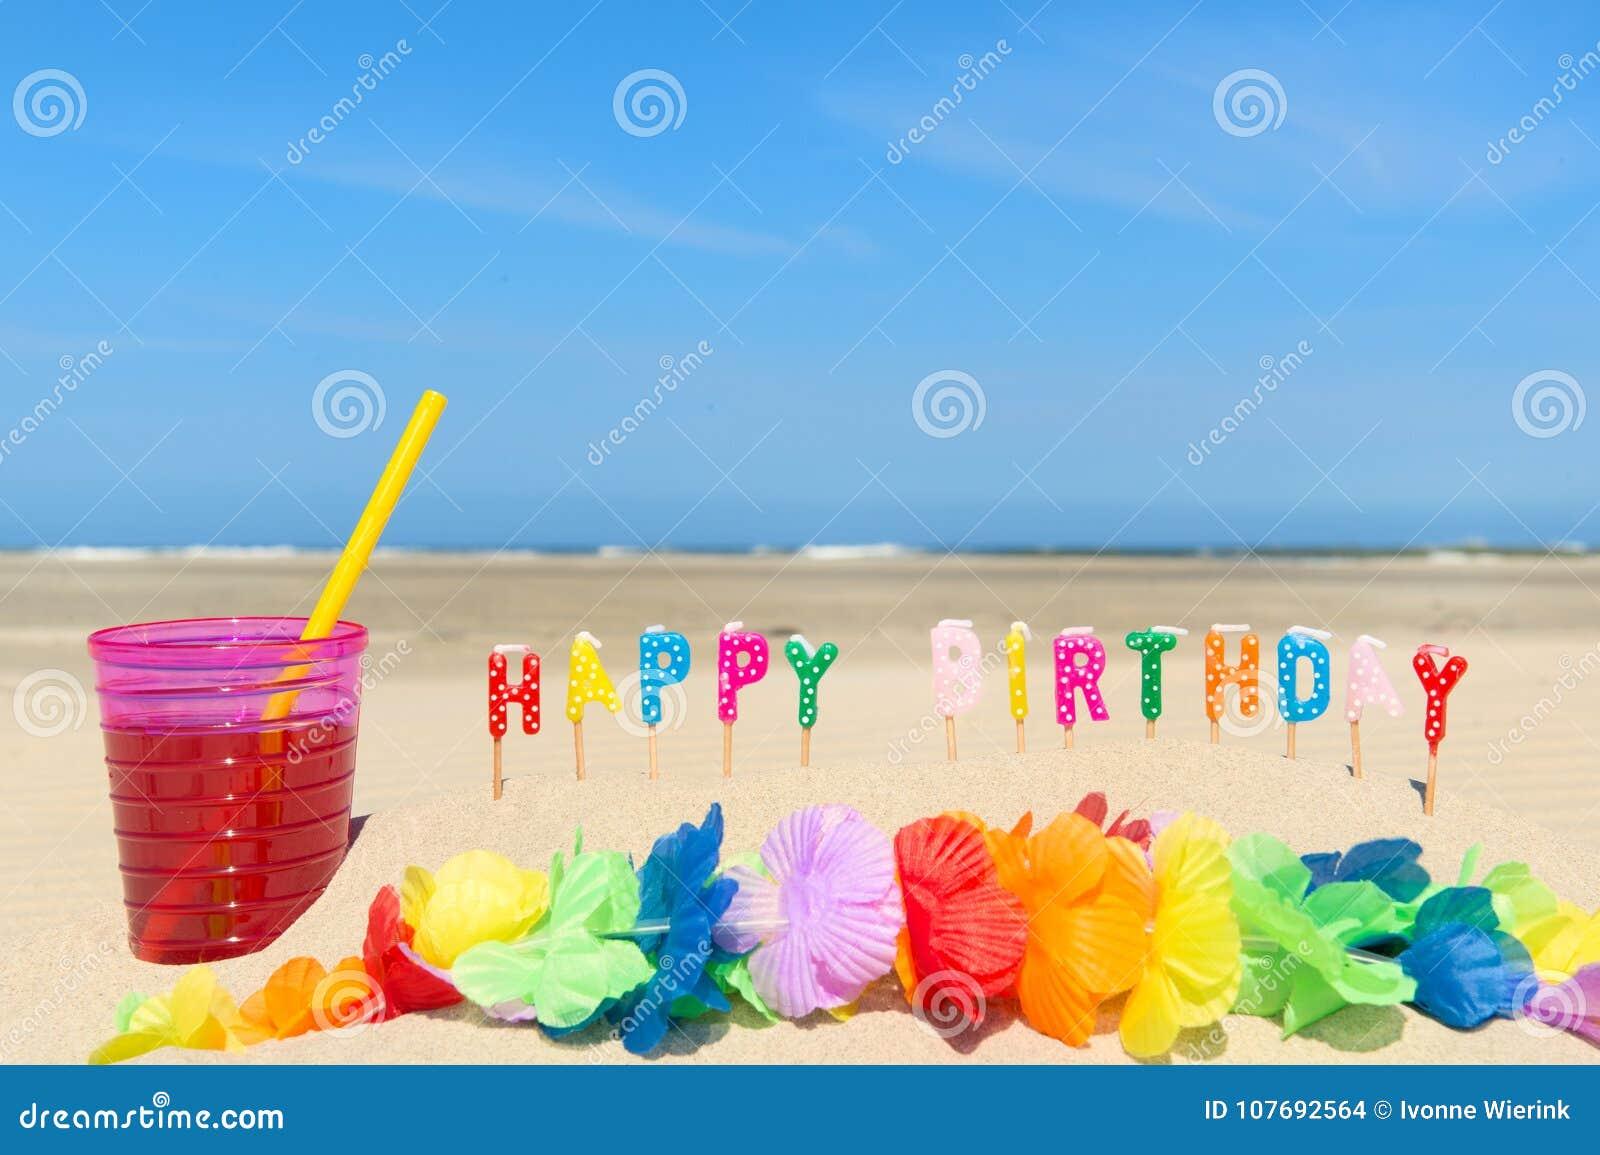 Feliz aniversario na praia